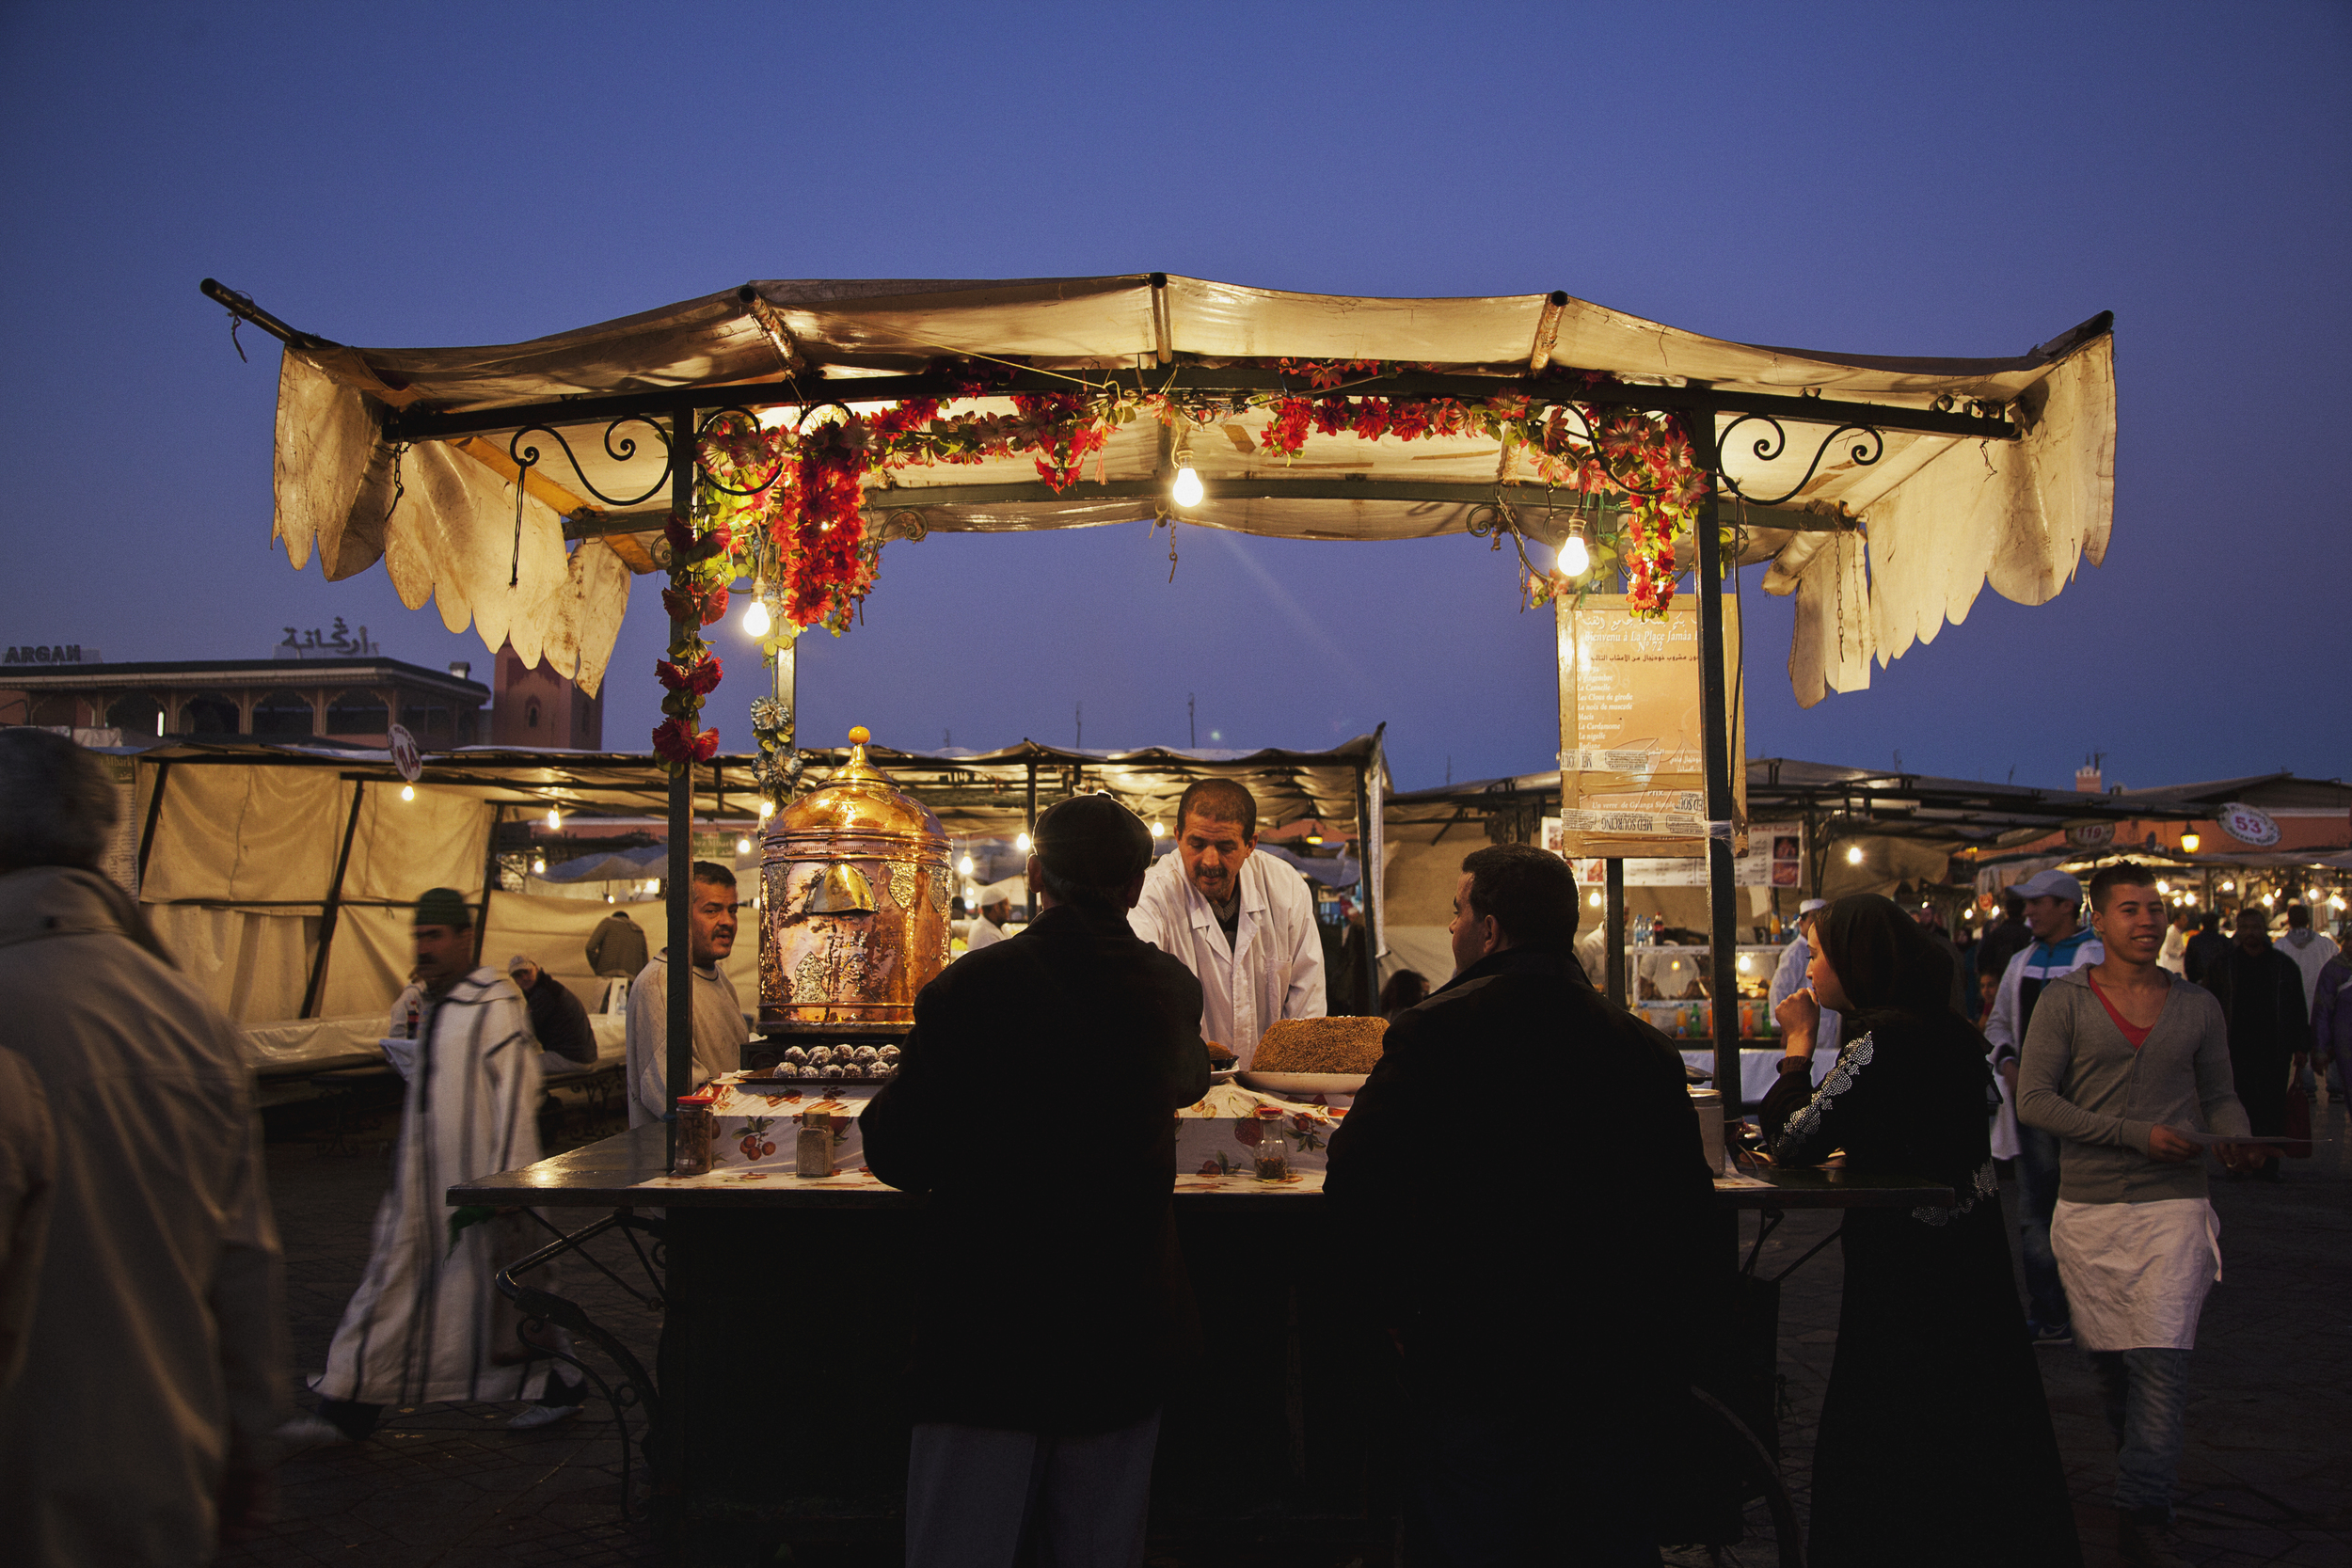 hot-tea-stand-jemaa-el-fnaa-travel-photographer.jpg